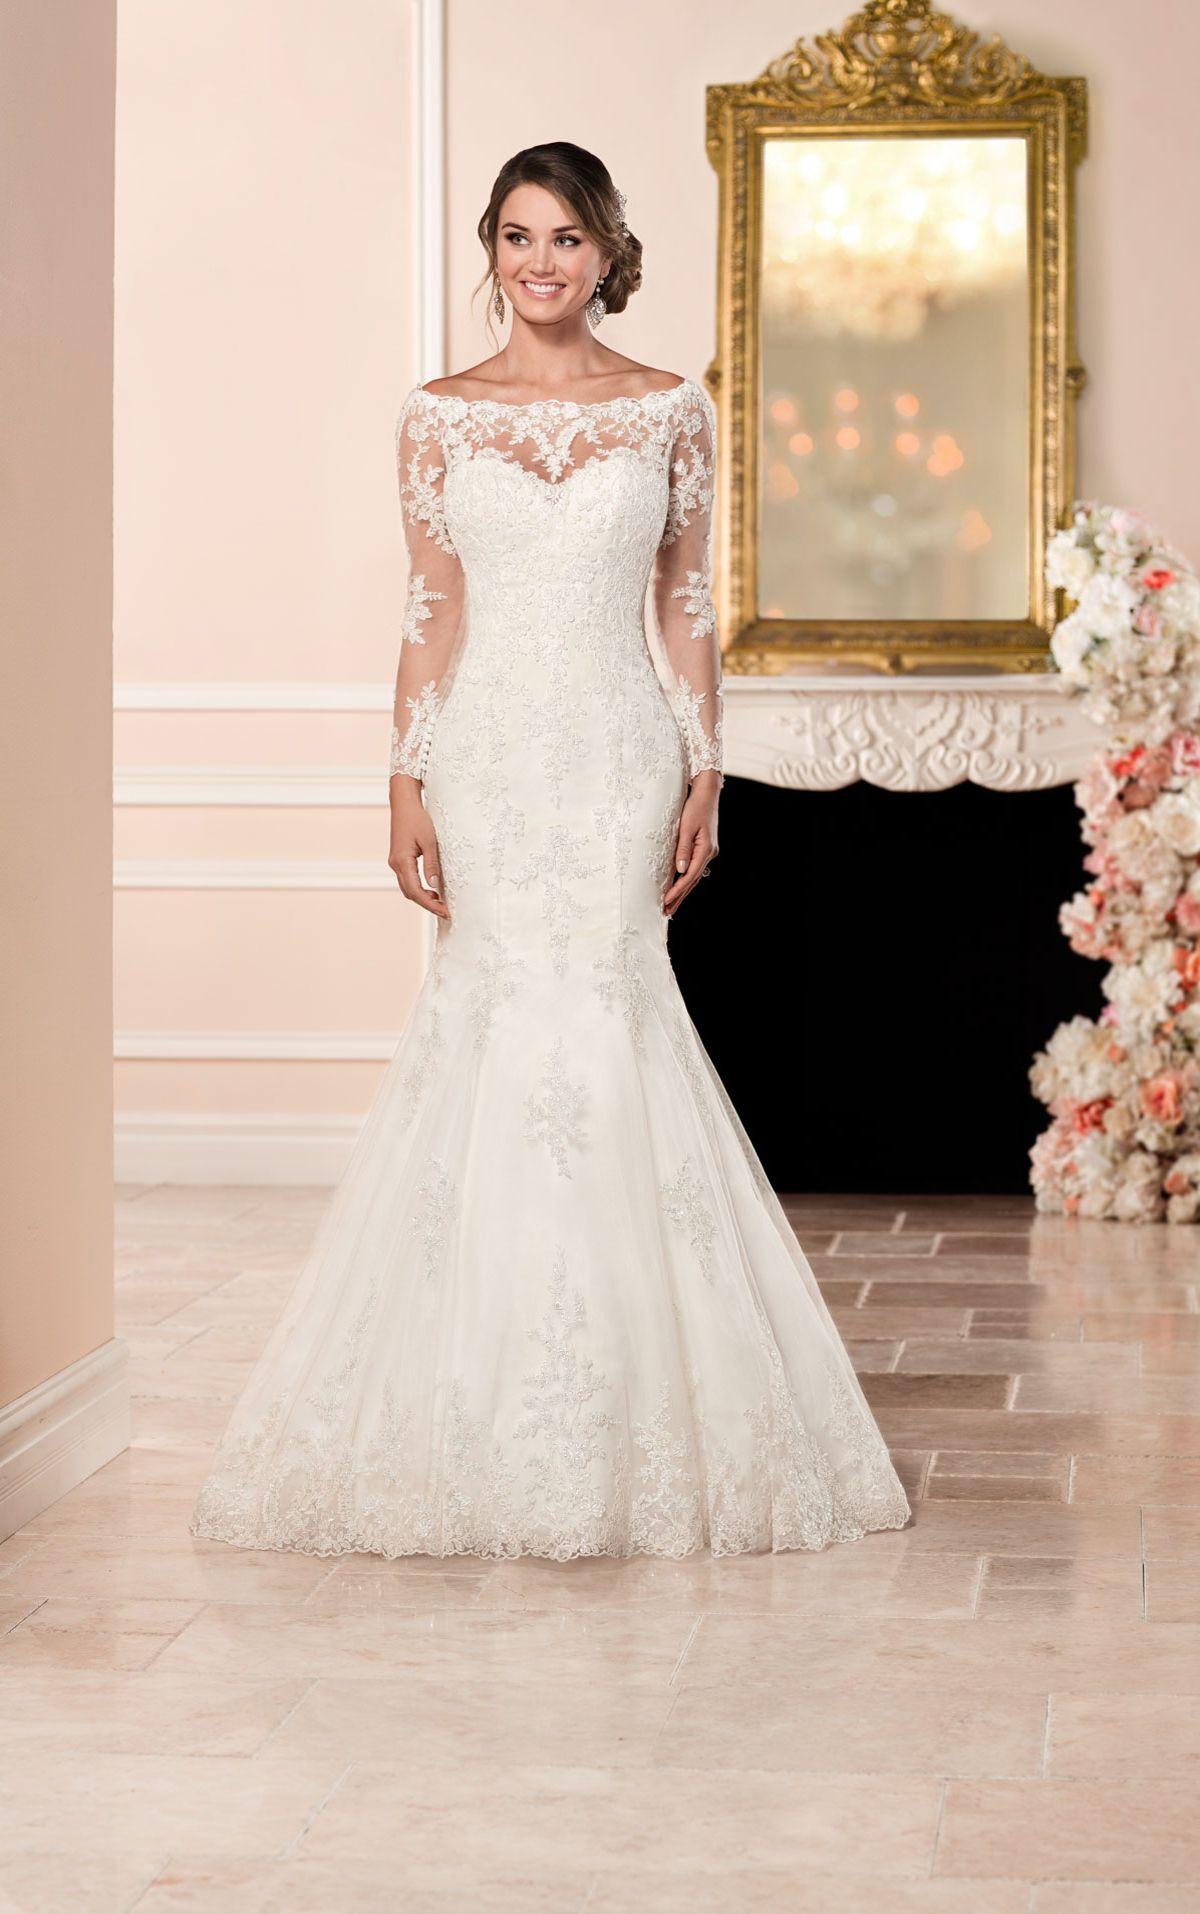 This satin fit u flare longsleeve wedding dress from stella york